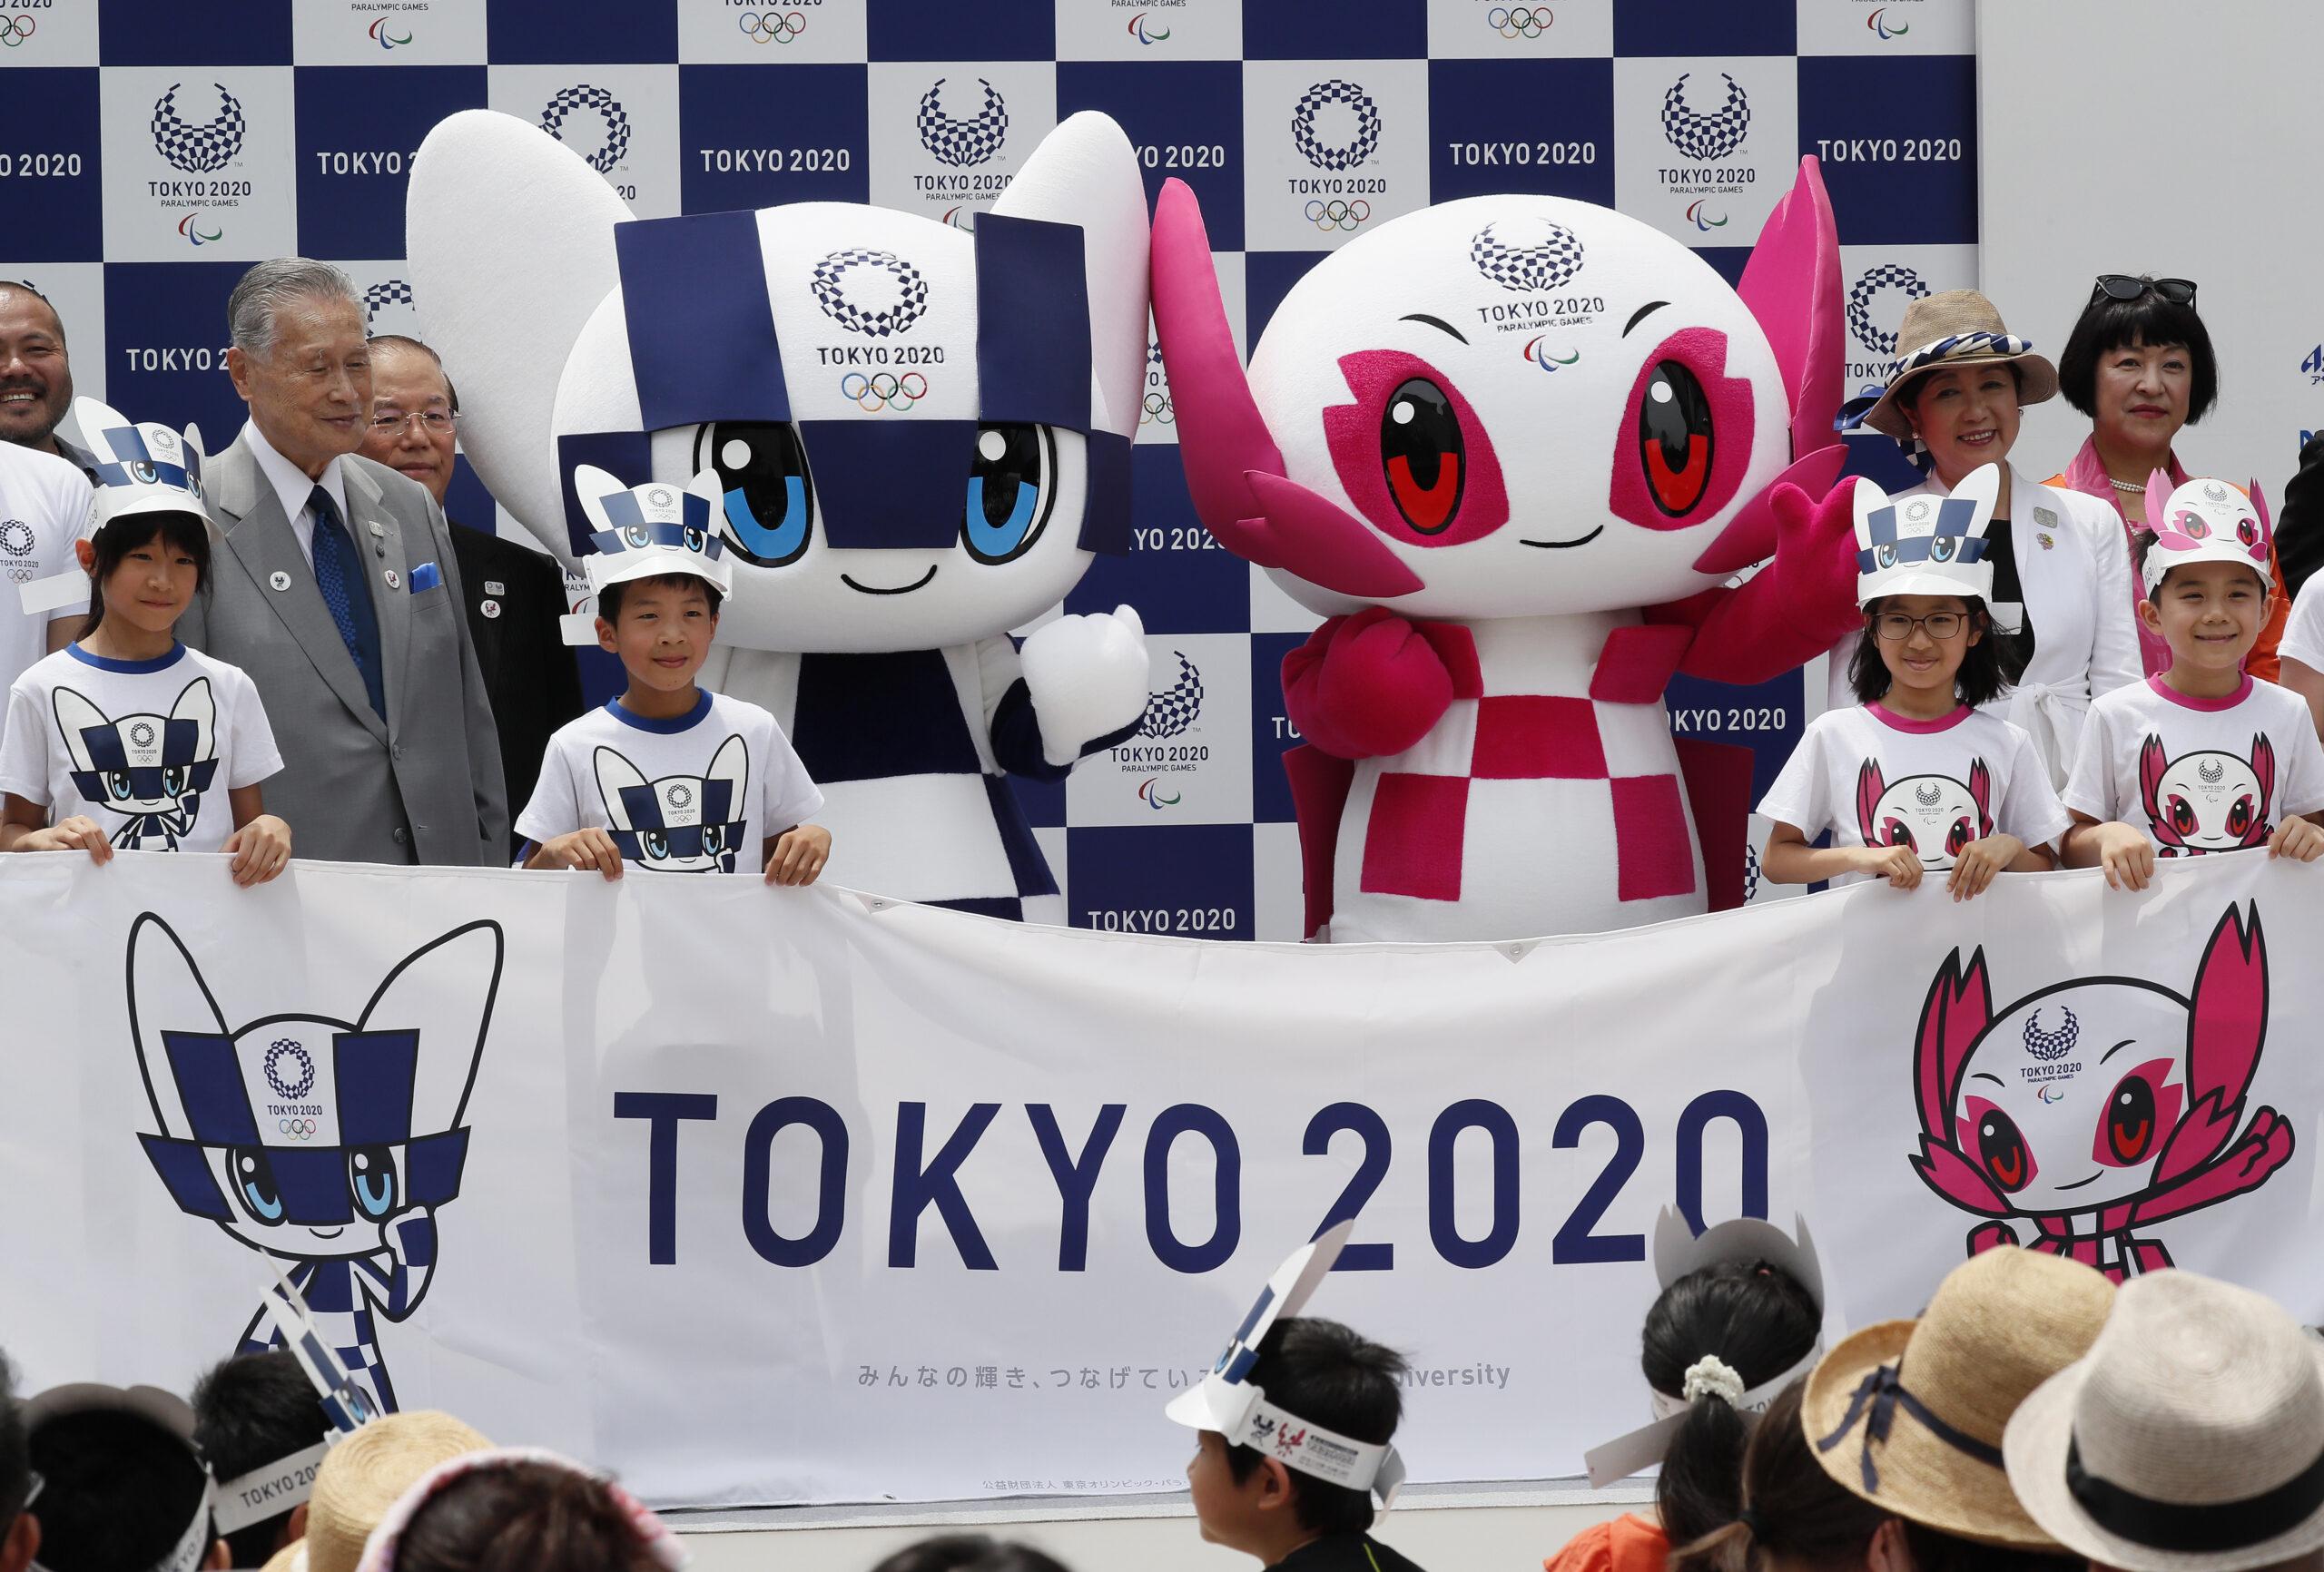 Tokyo 2020 Olympics mascot Miraitowa and Paralympics mascot Someity debut